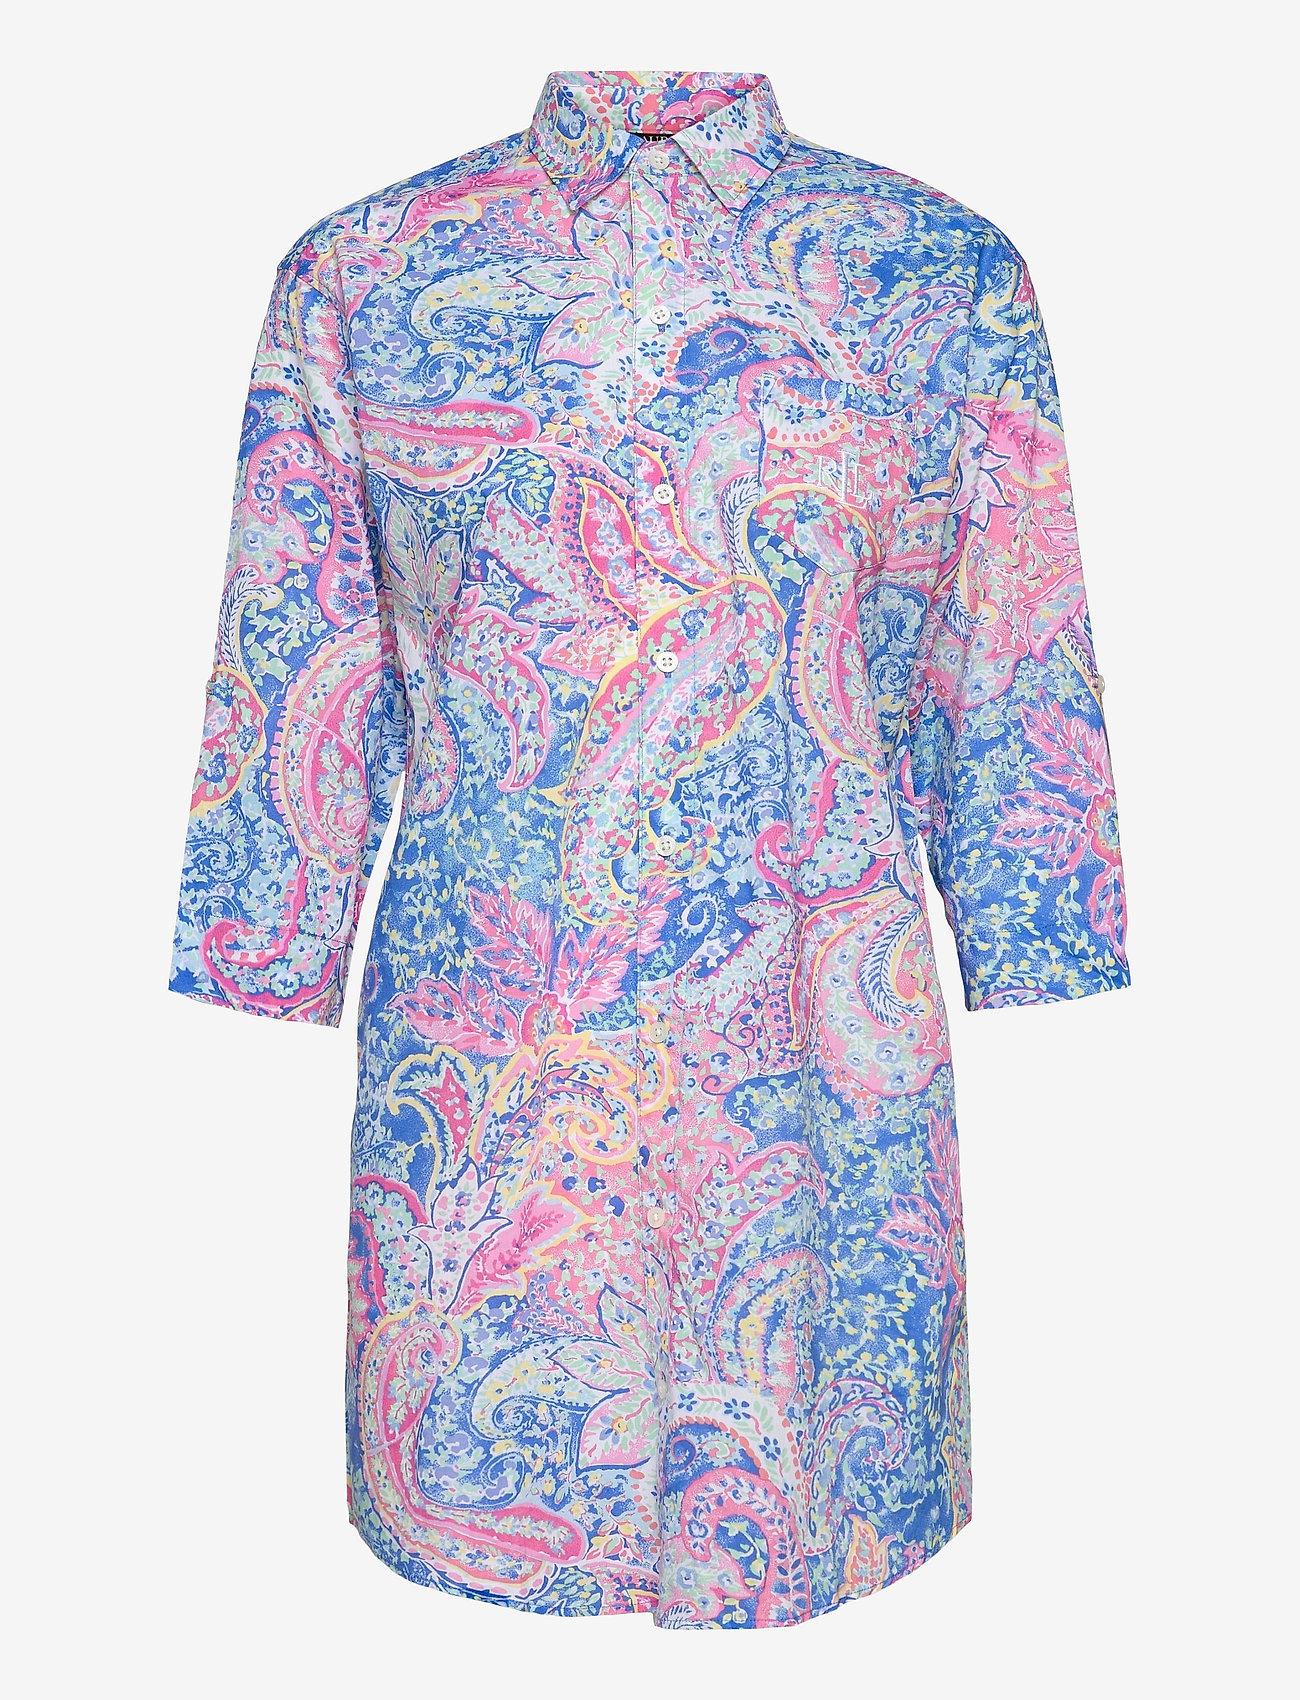 Lauren Ralph Lauren Homewear - LRL ROLL TAB HIS SLEEPSHIRT - natkjoler - multi paisley - 0